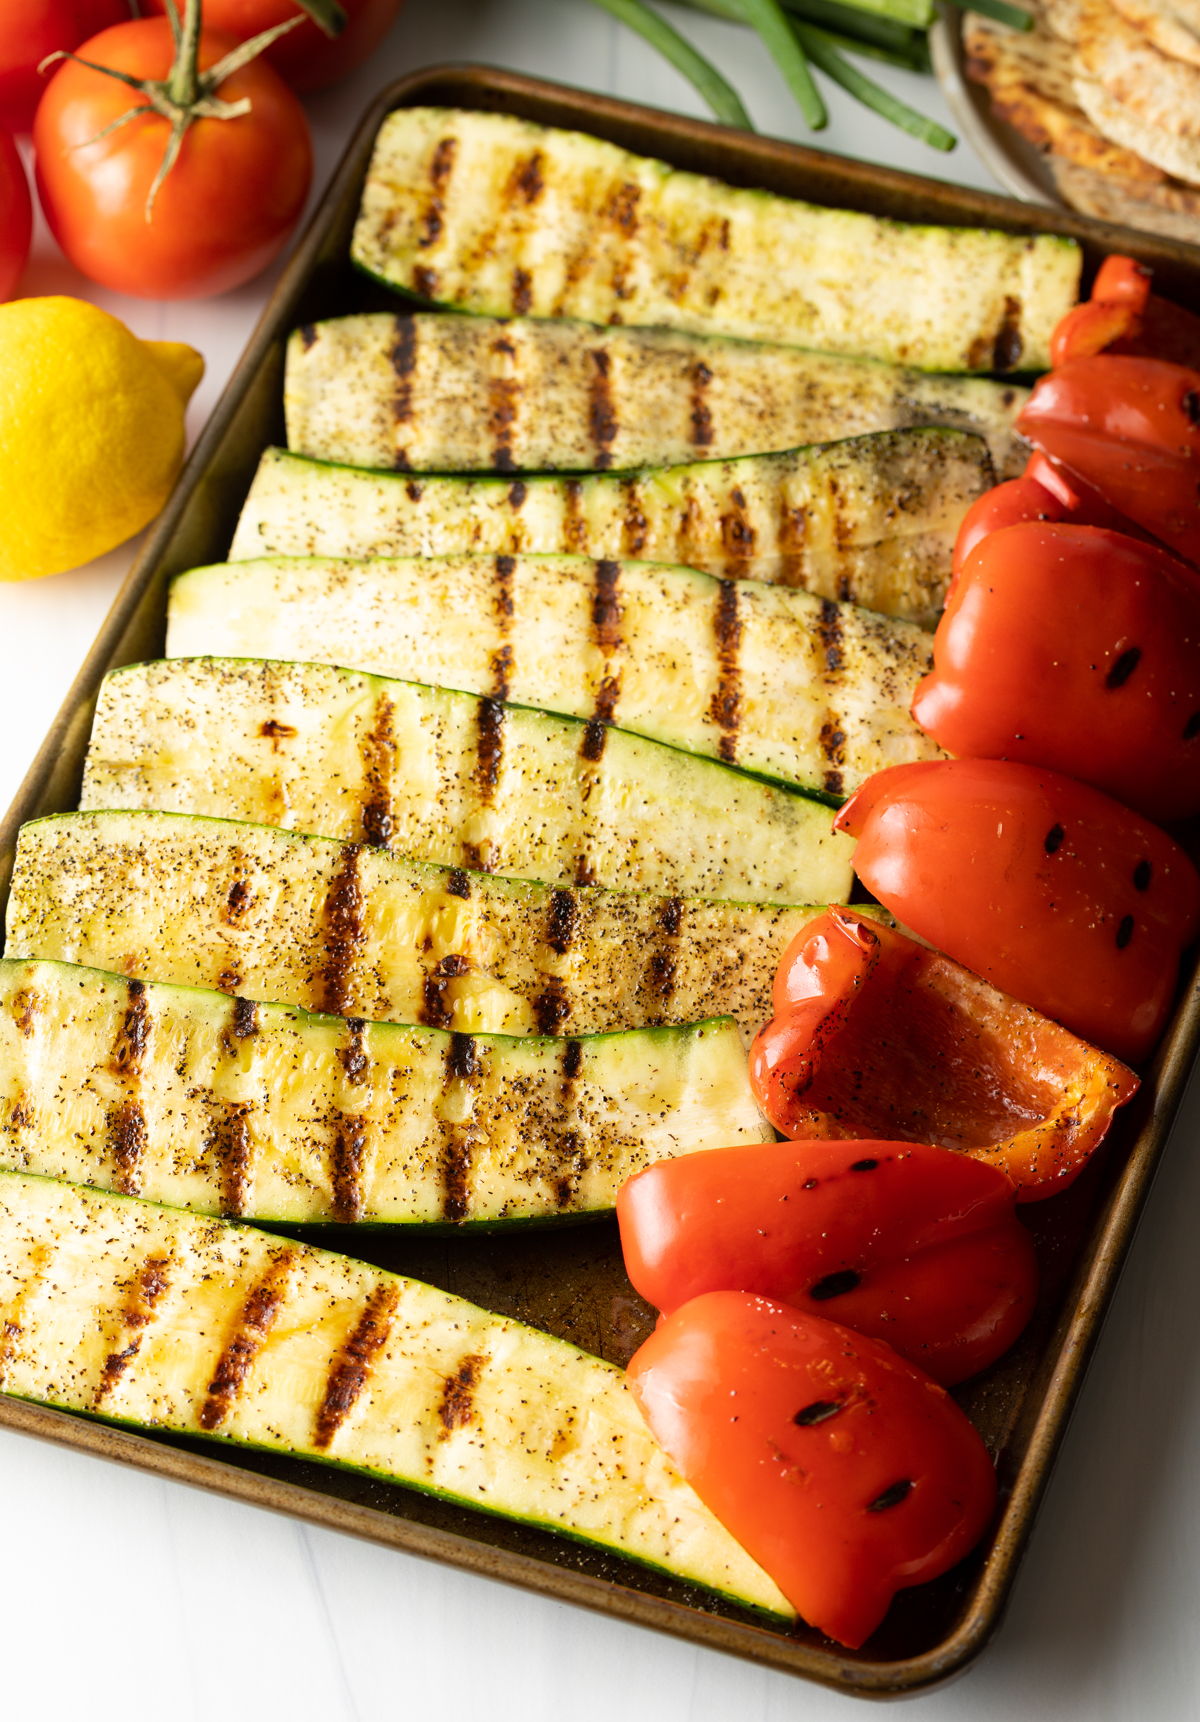 Grilled Vegetables for Fattoush Salad